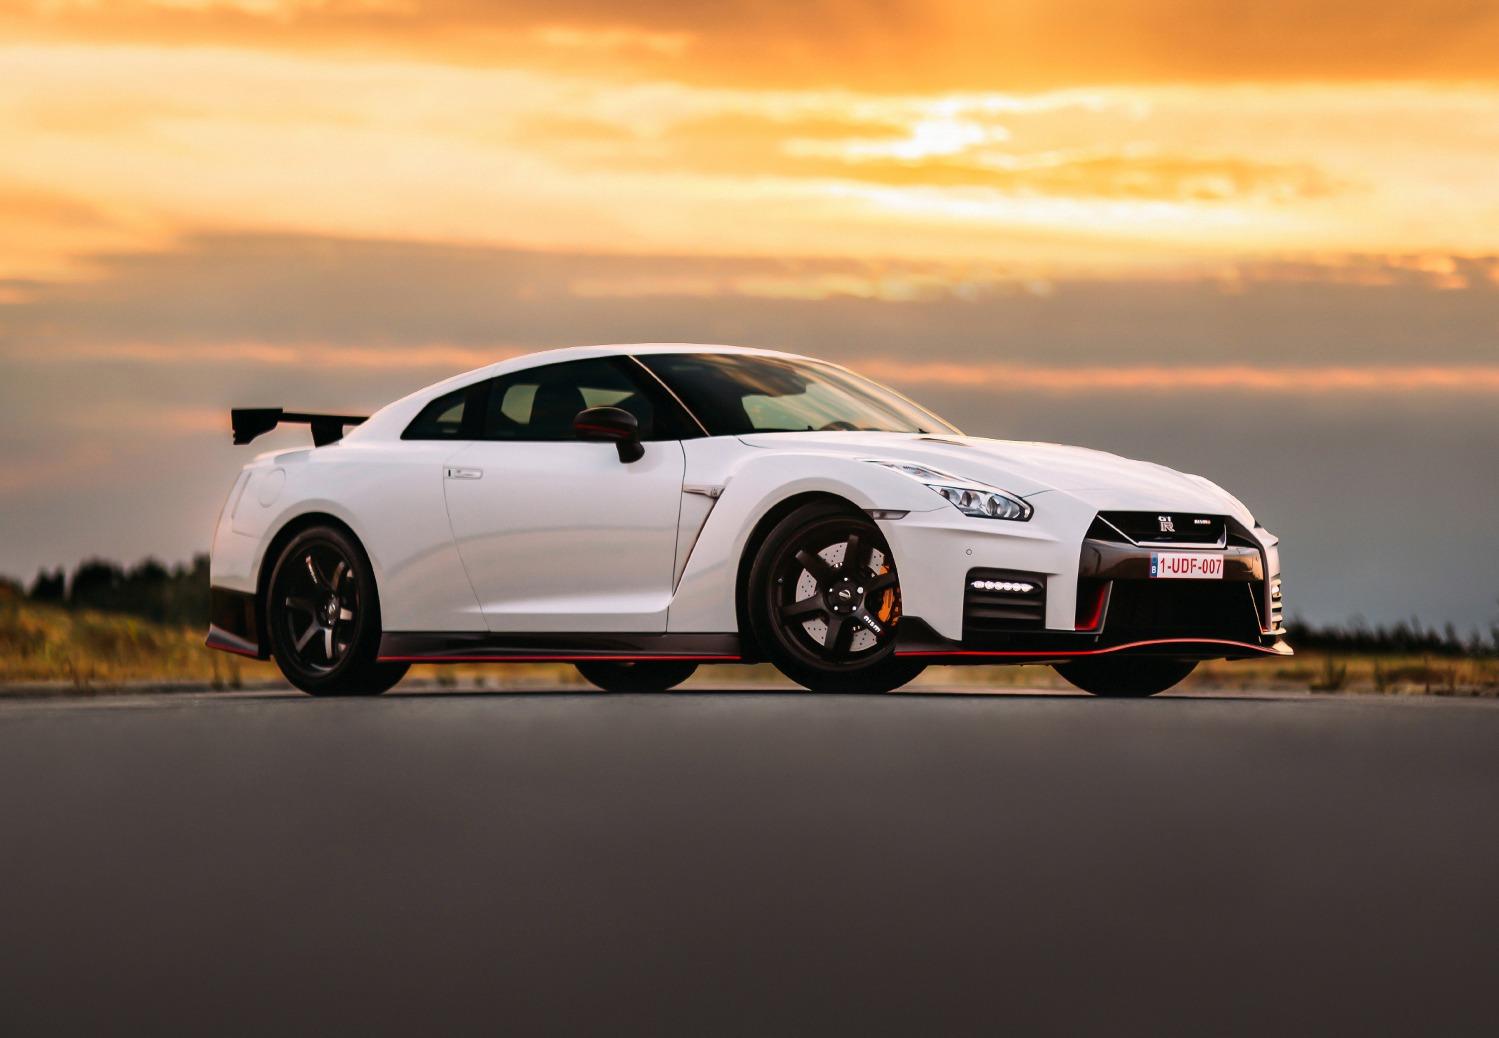 Rijtest: Nissan GT-R NISMO